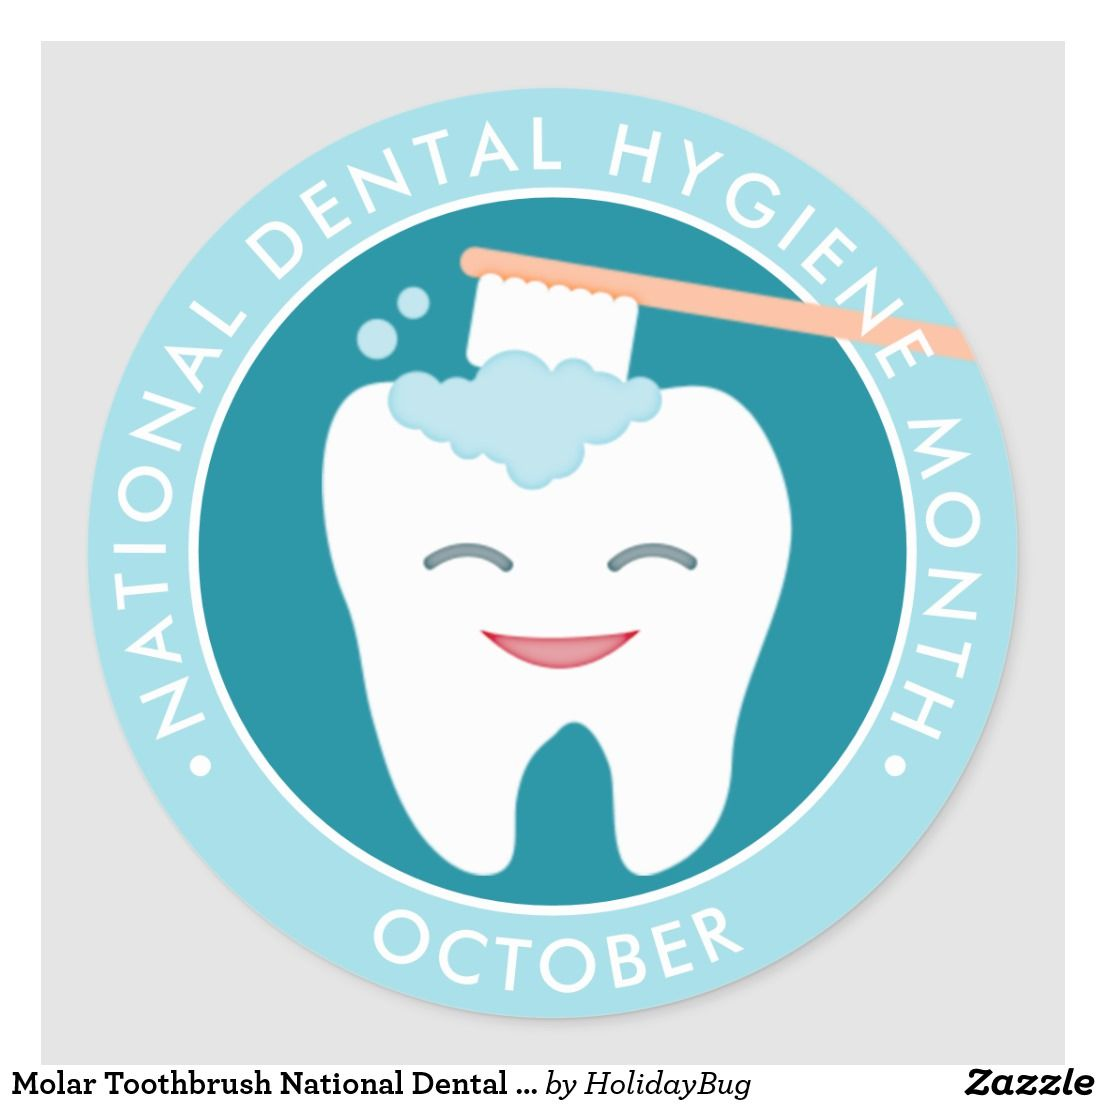 Molar Toothbrush National Dental Hygiene Month Classic Round Sticker    Zazzle.com in 2021   Dental hygiene, Dental fun, Dental facts